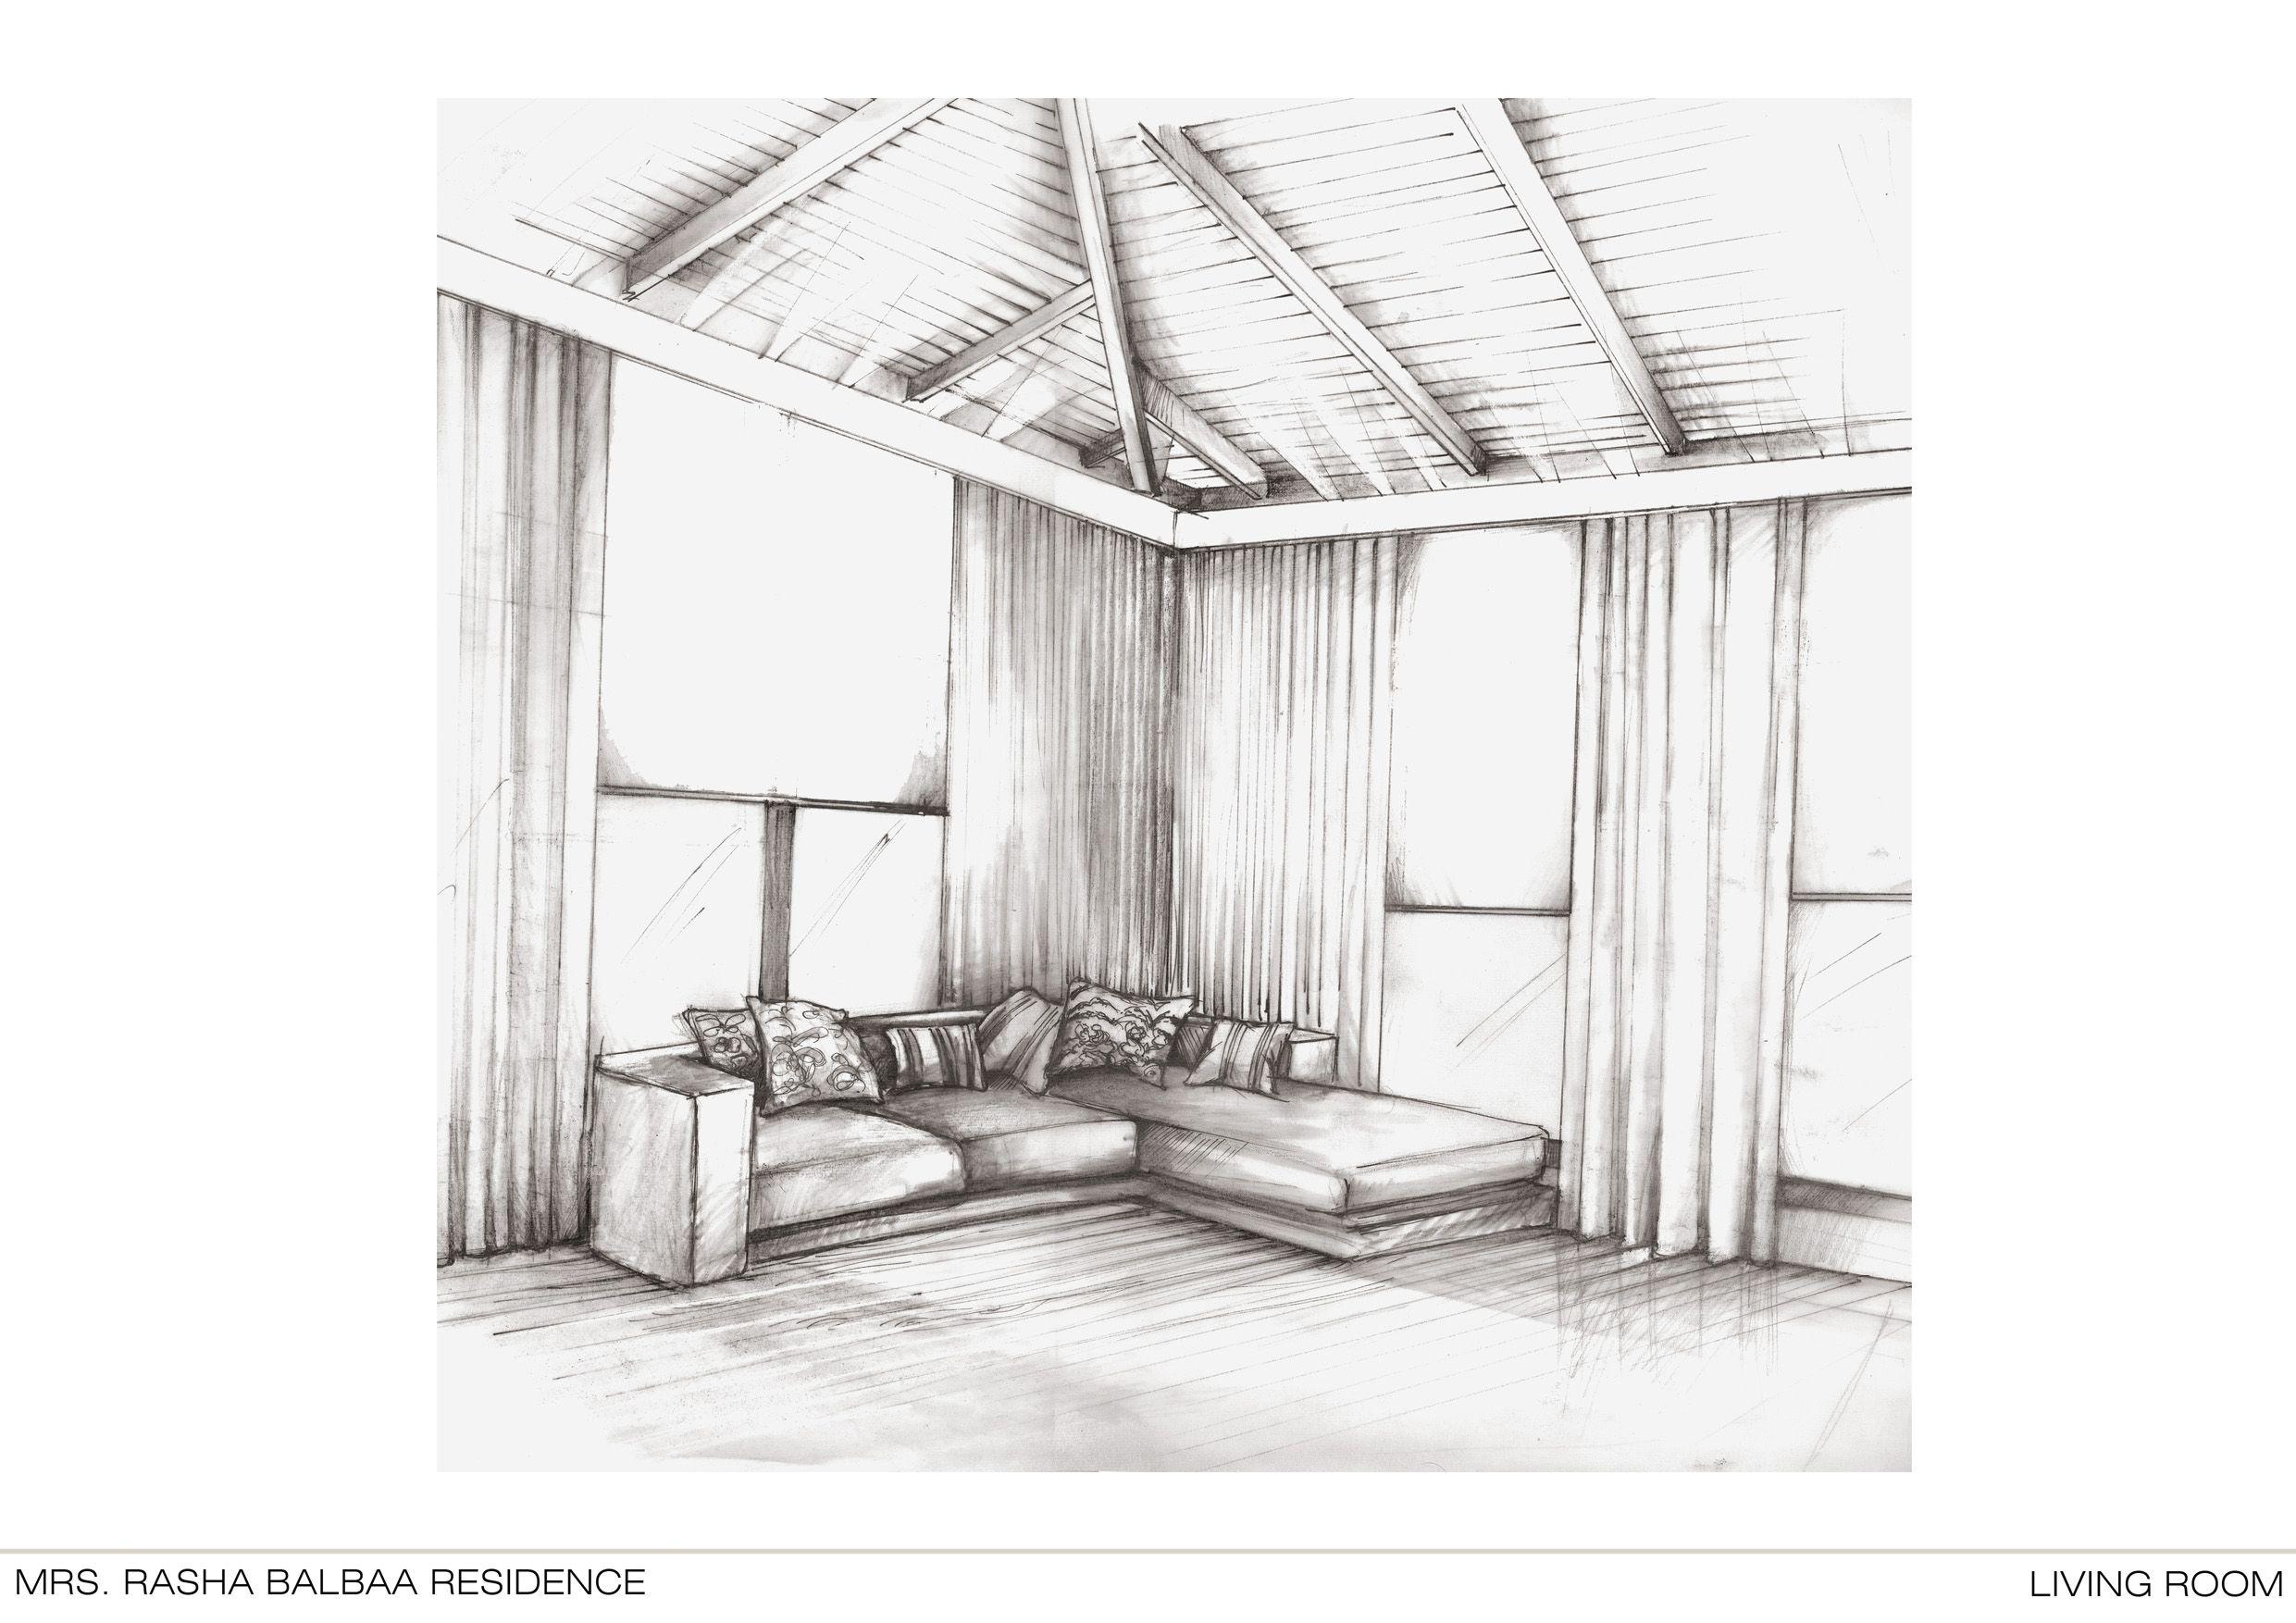 Bedroom sketch by Nour Hassouna | Bedroom suite delivered 2009 ...